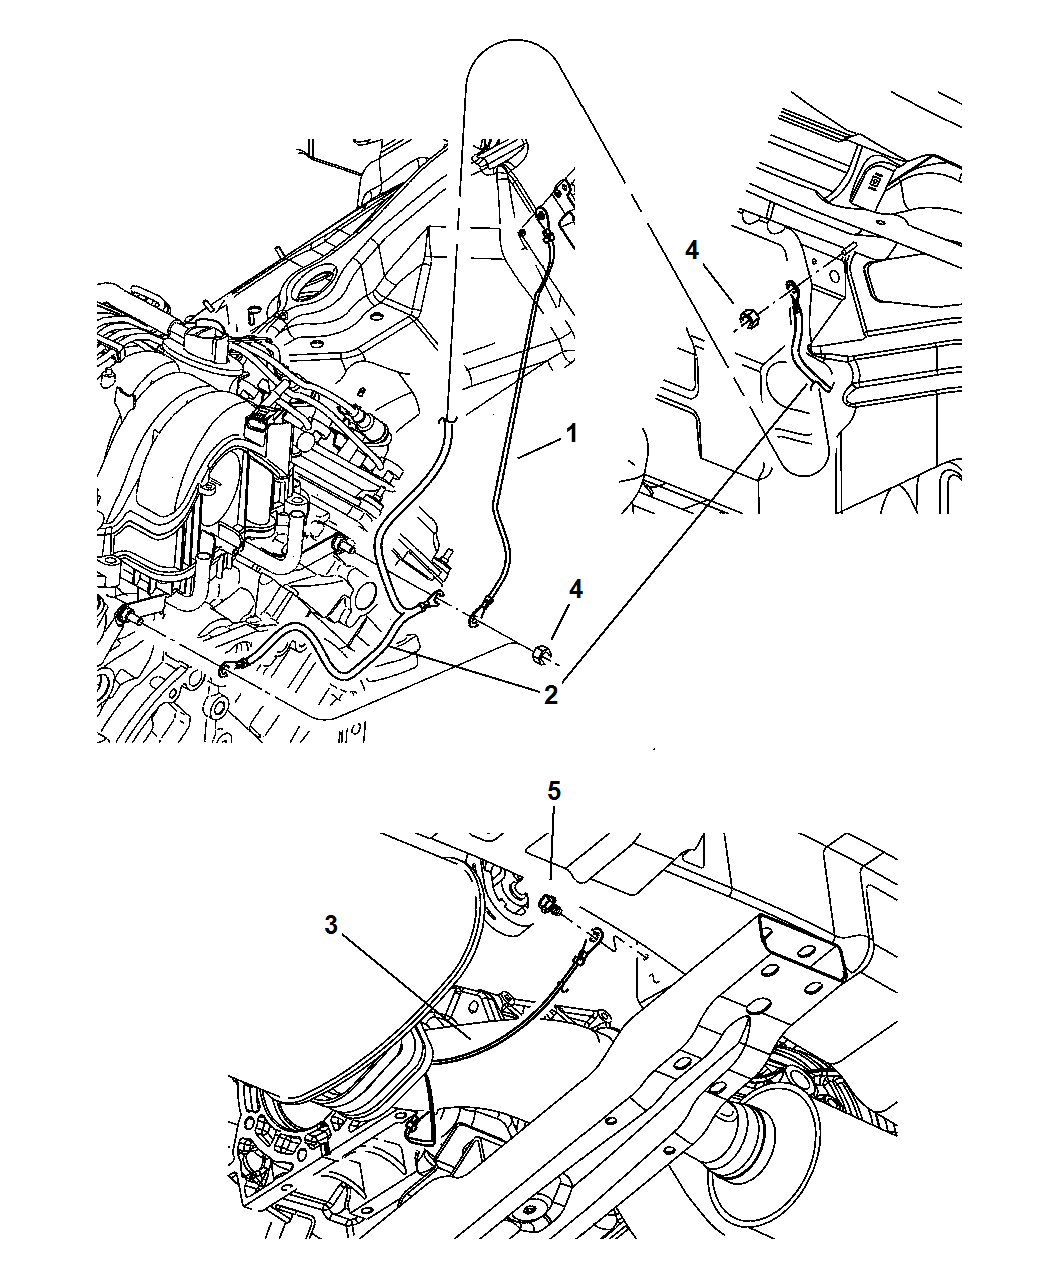 [SCHEMATICS_49CH]  MH_3517] Diagram Of Engine Compartment 2007 Jeep Commander Schematic Wiring   2007 Jeep Commander Radio Wiring Diagram      Acion Hyedi Mohammedshrine Librar Wiring 101